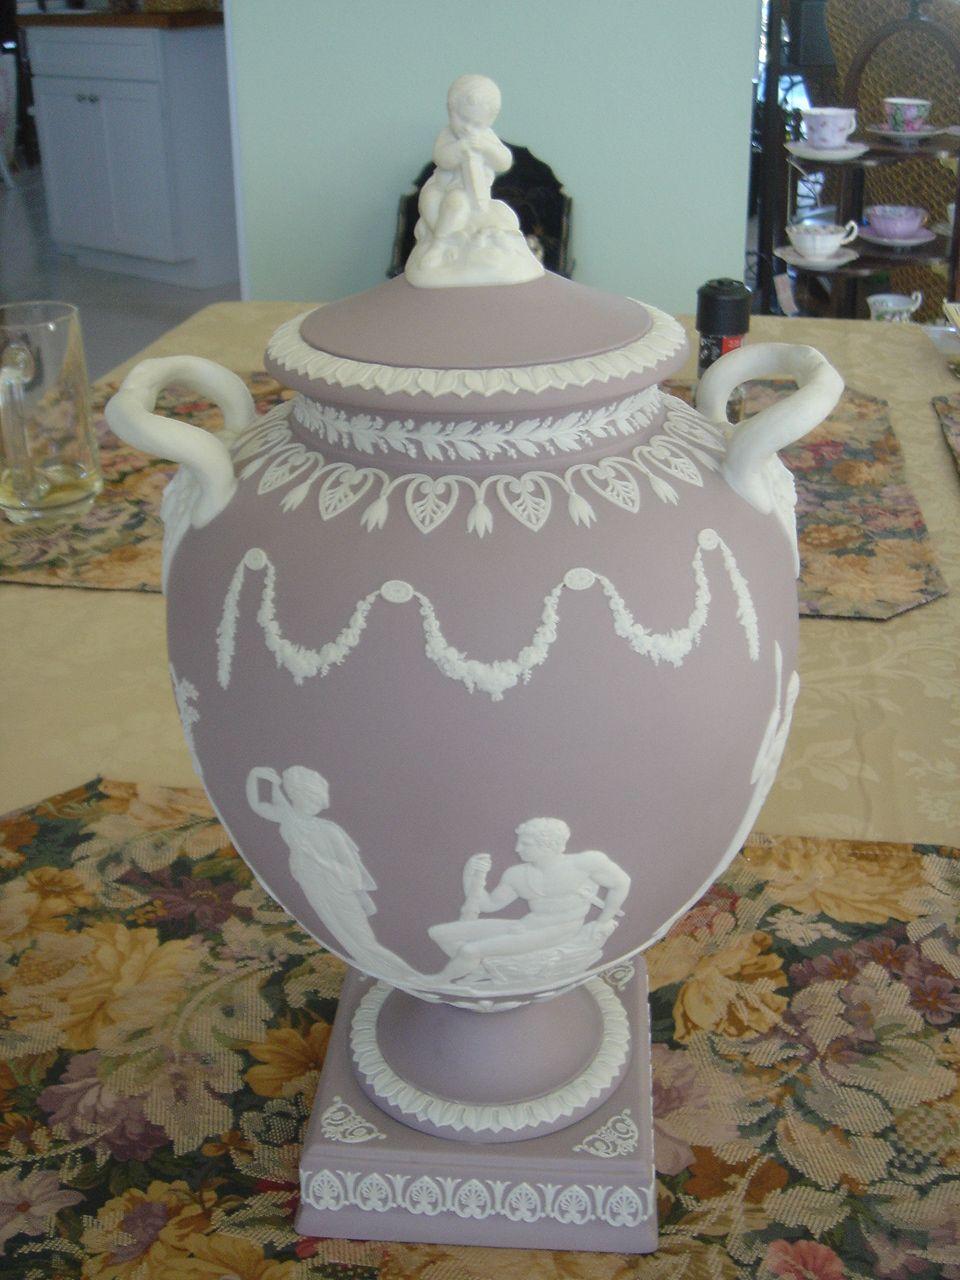 Lilac jasperware wedgwood jasperware ceramica inglesa for Vajillas porcelana clasicas